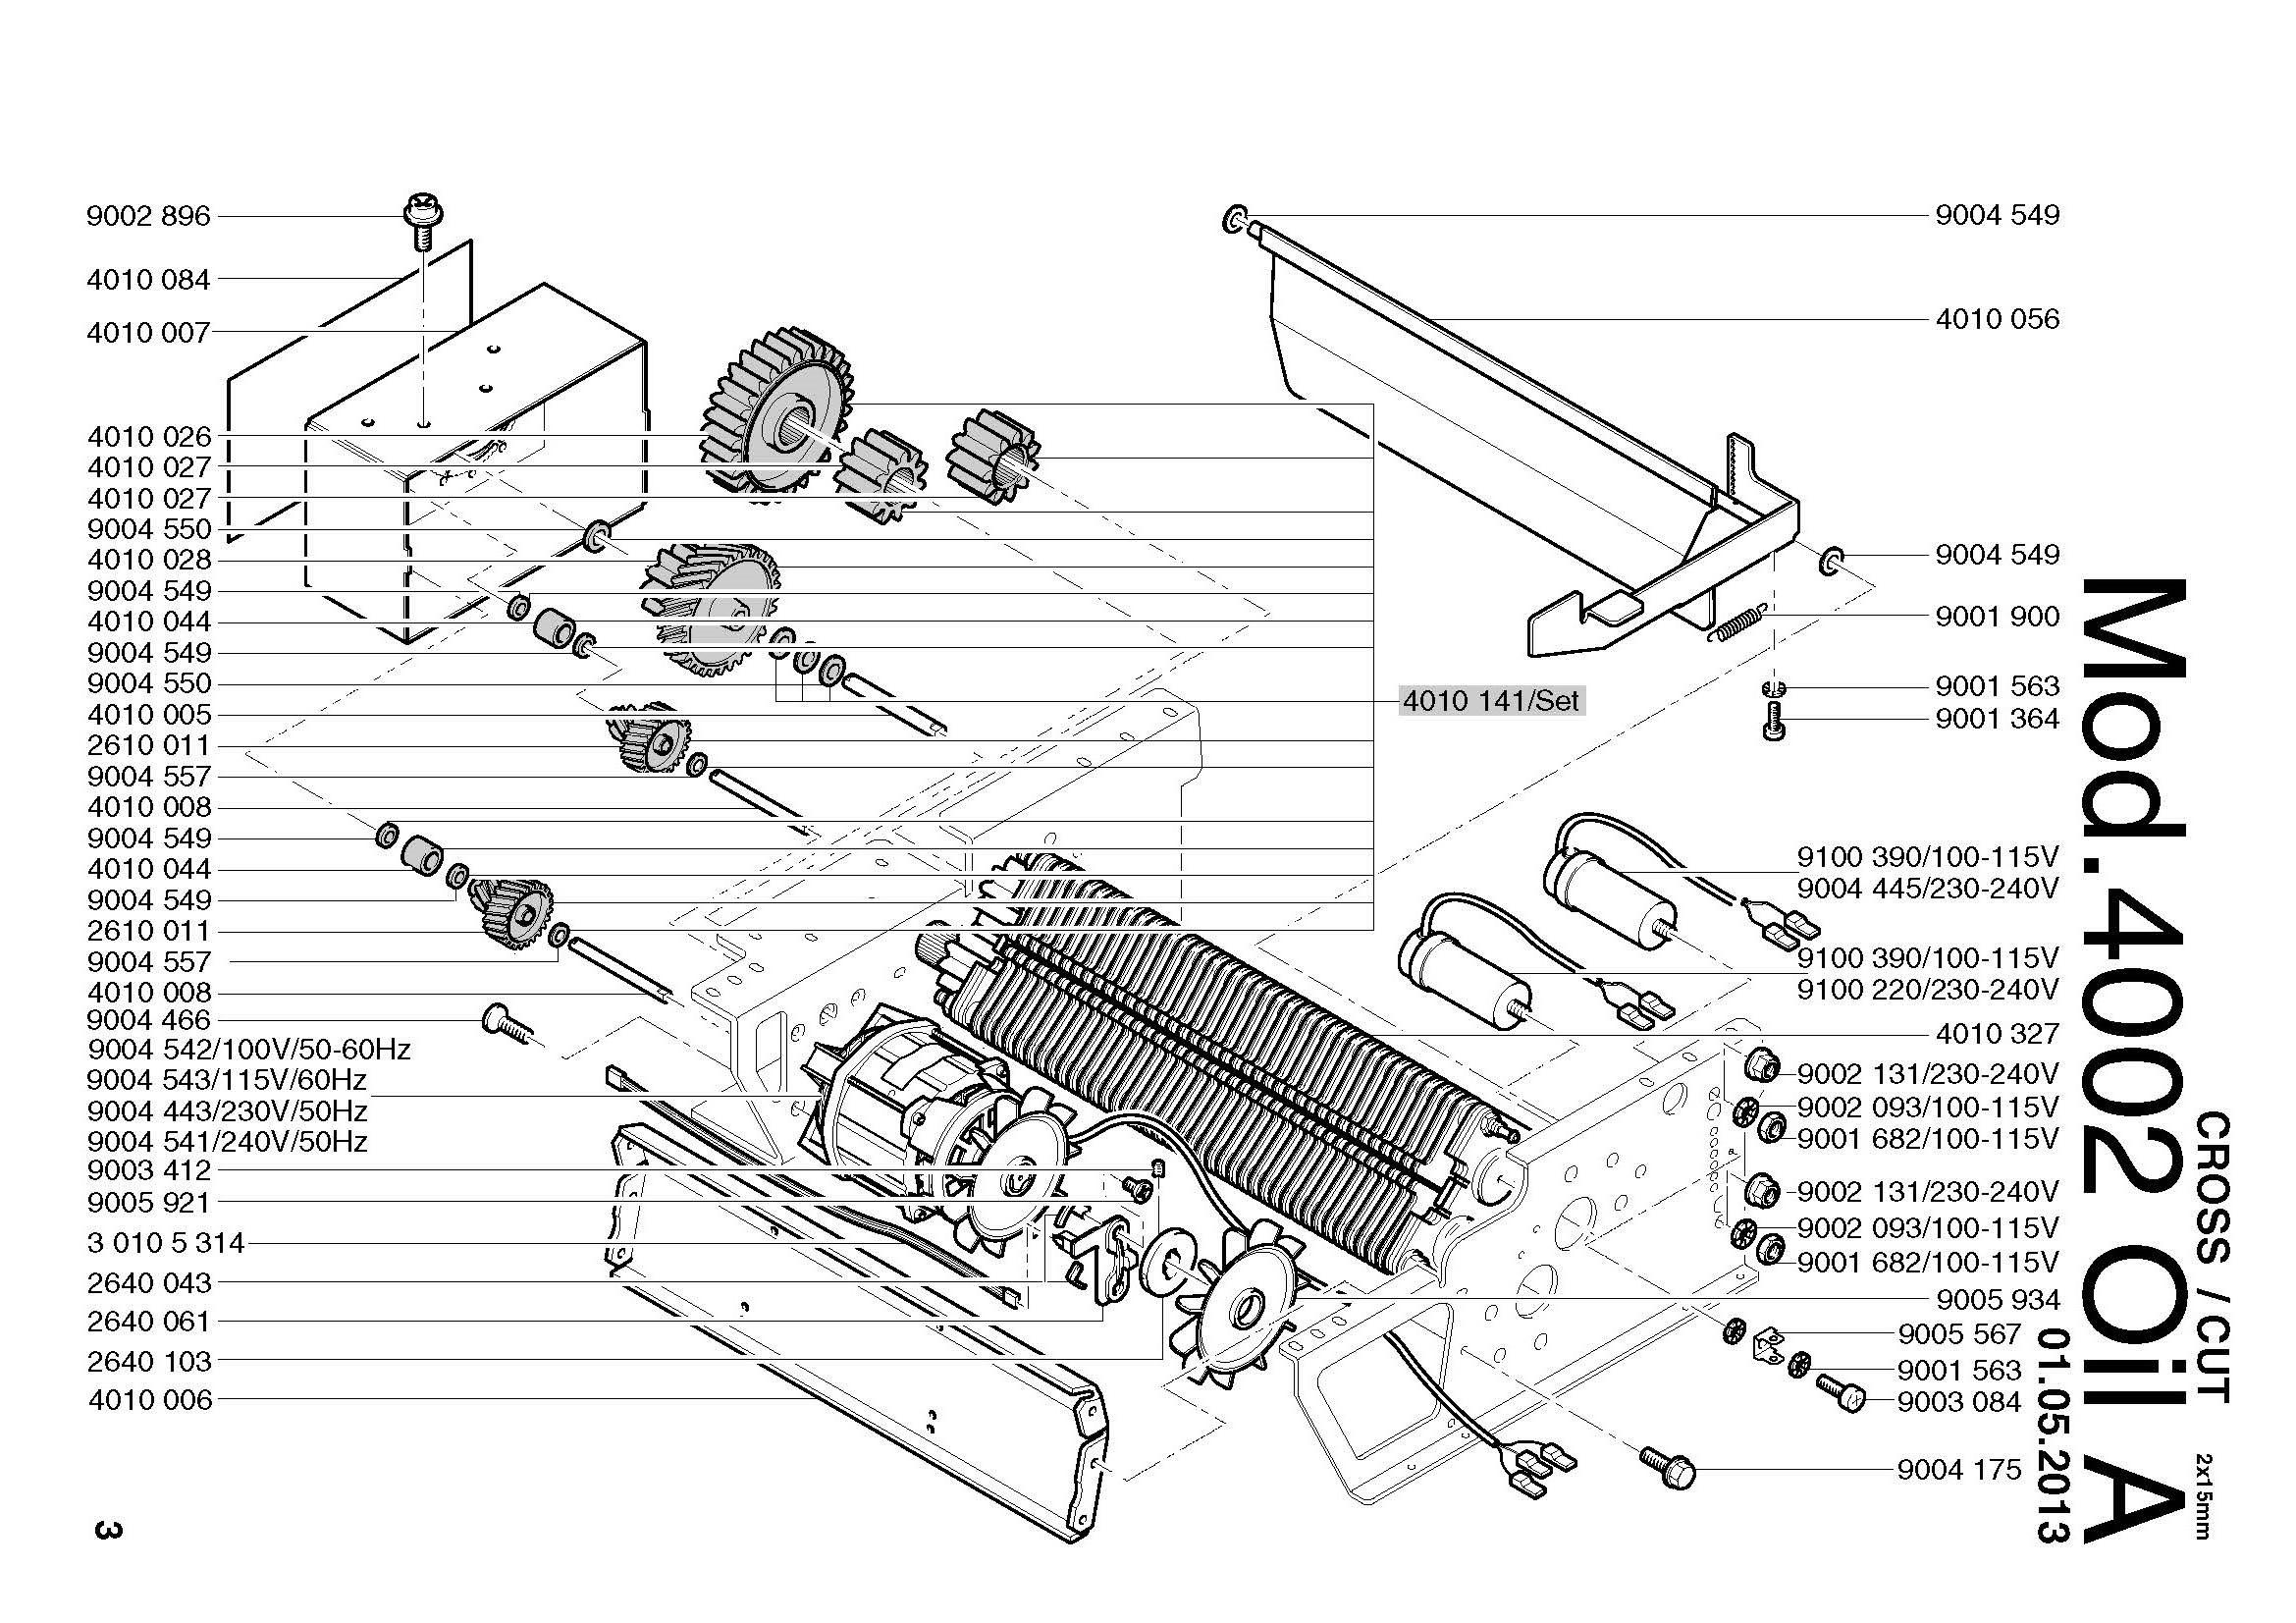 18650 box mod wiring diagram vape mod wiring